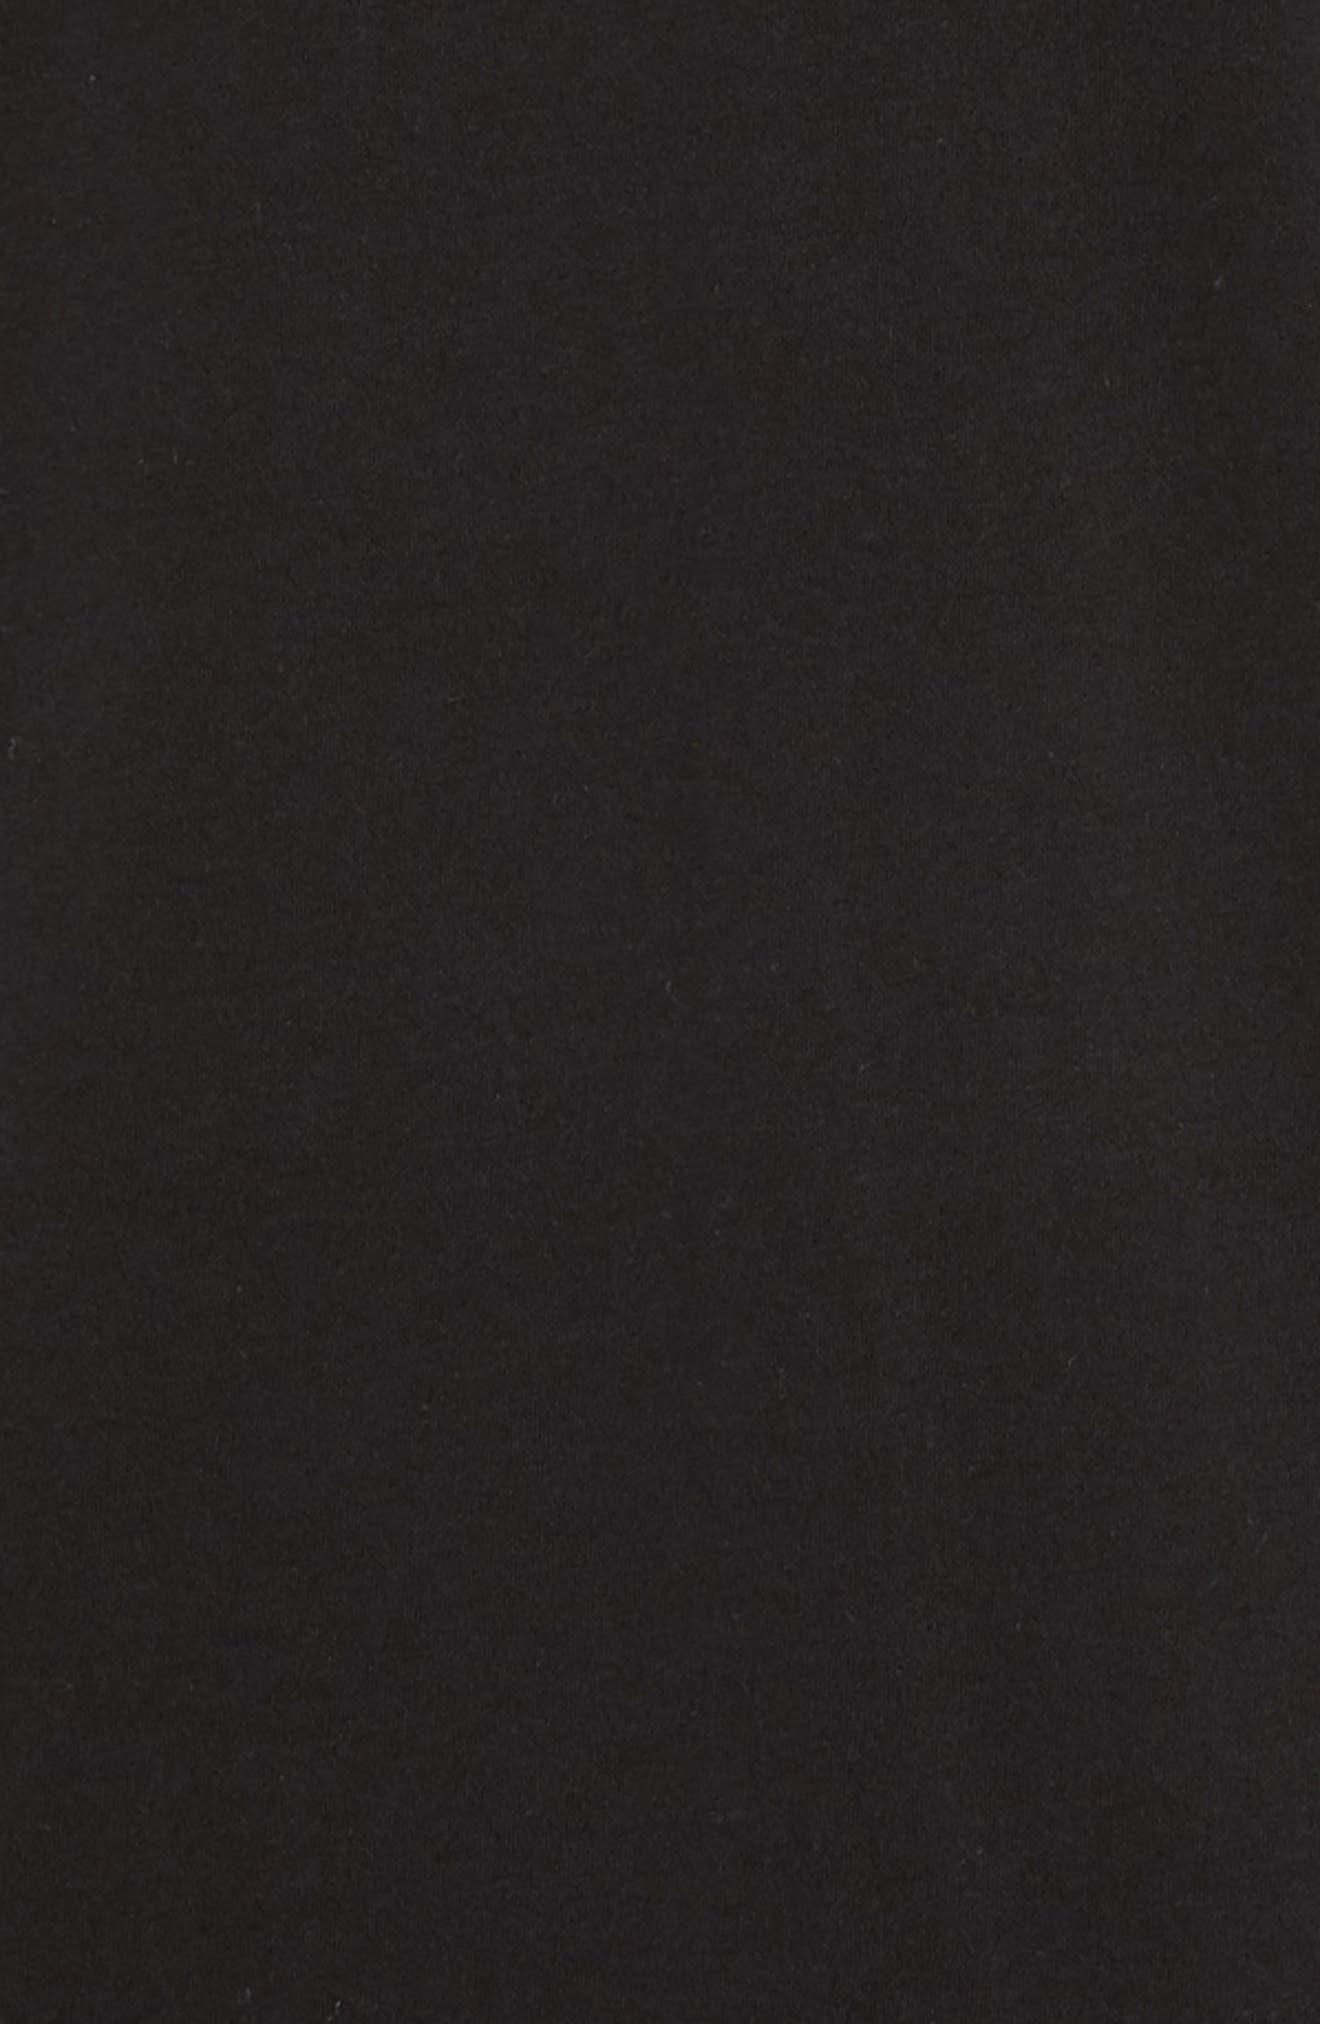 Rupert Short Sleeve Regular Fit Polo Shirt,                             Alternate thumbnail 5, color,                             BLACK